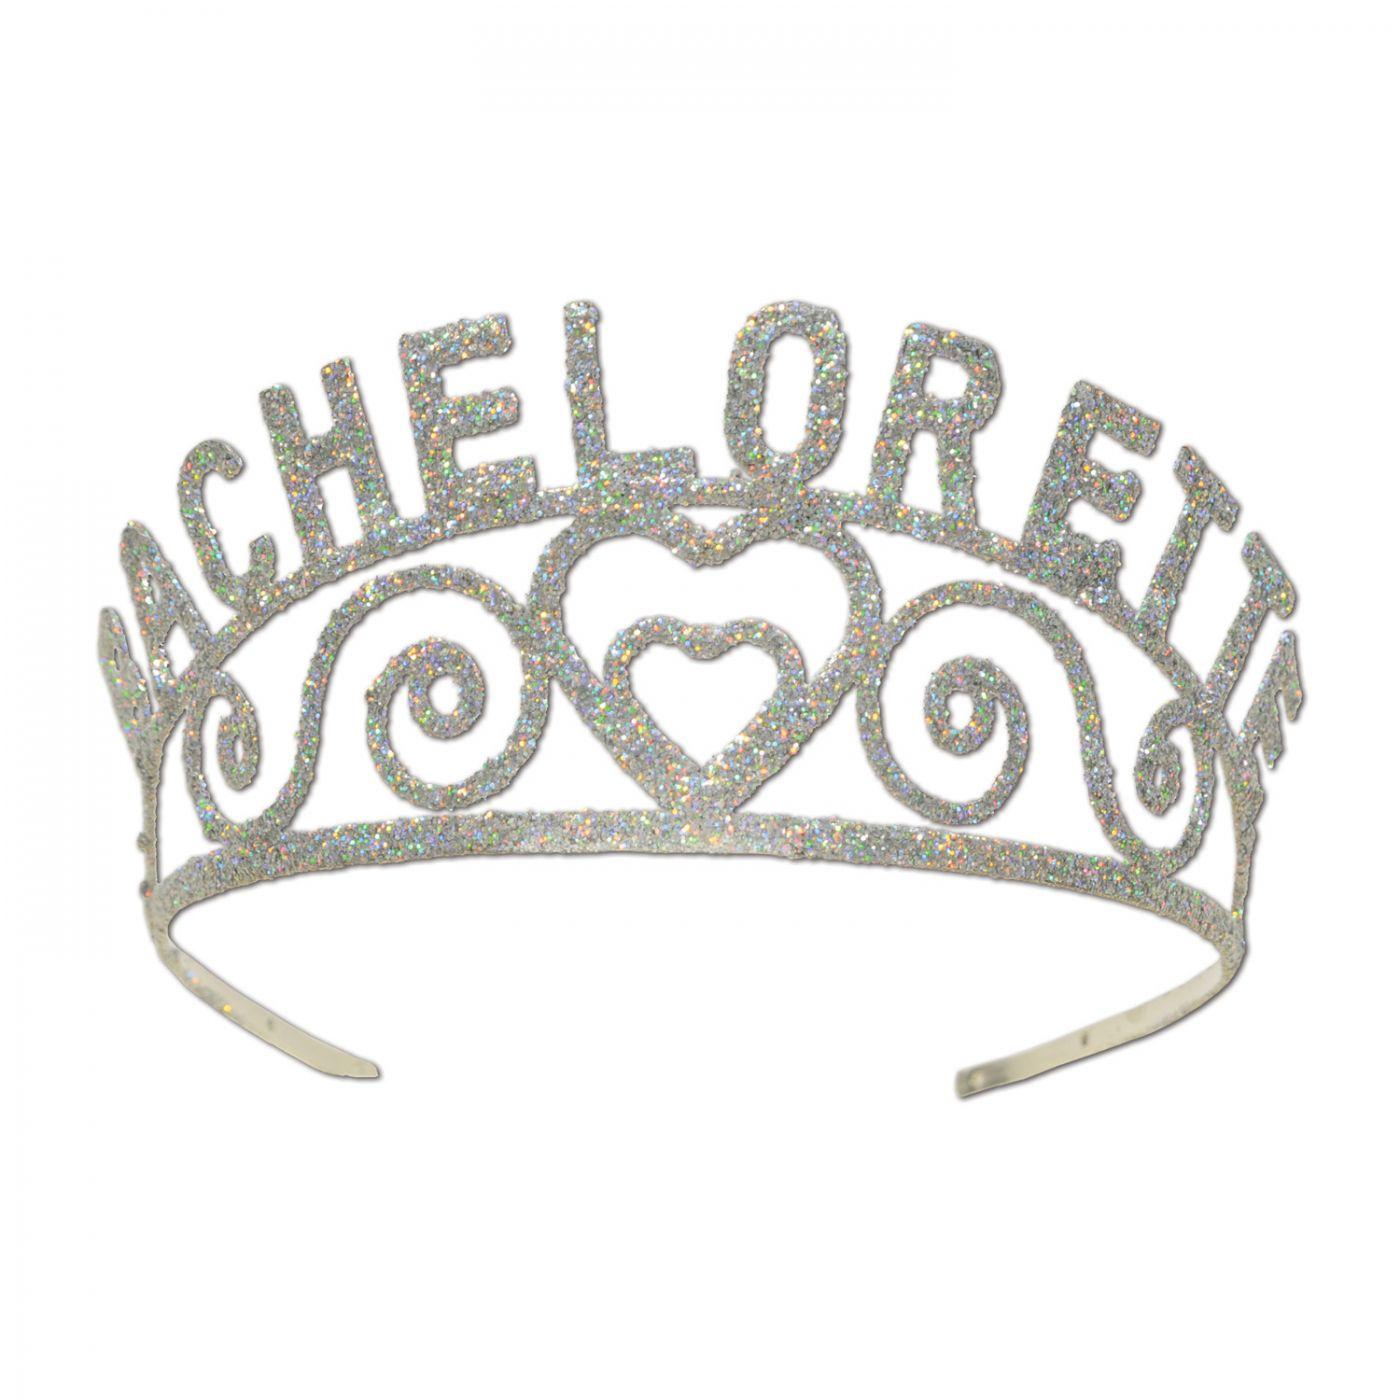 Glittered Metal Bachelorette Tiara (6) image